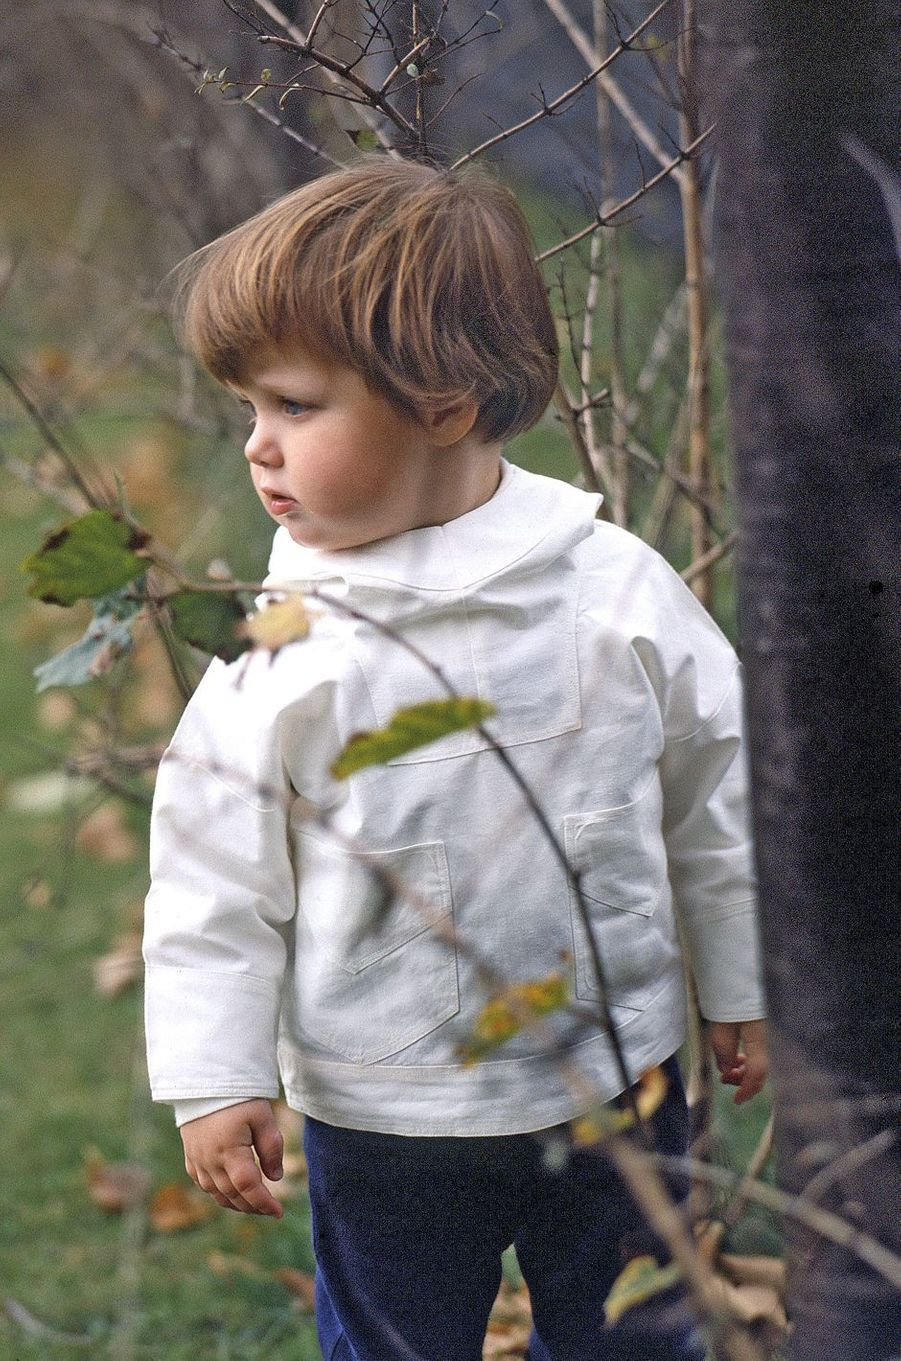 Le prince Frederik de Danemark le 26 octobre 1970